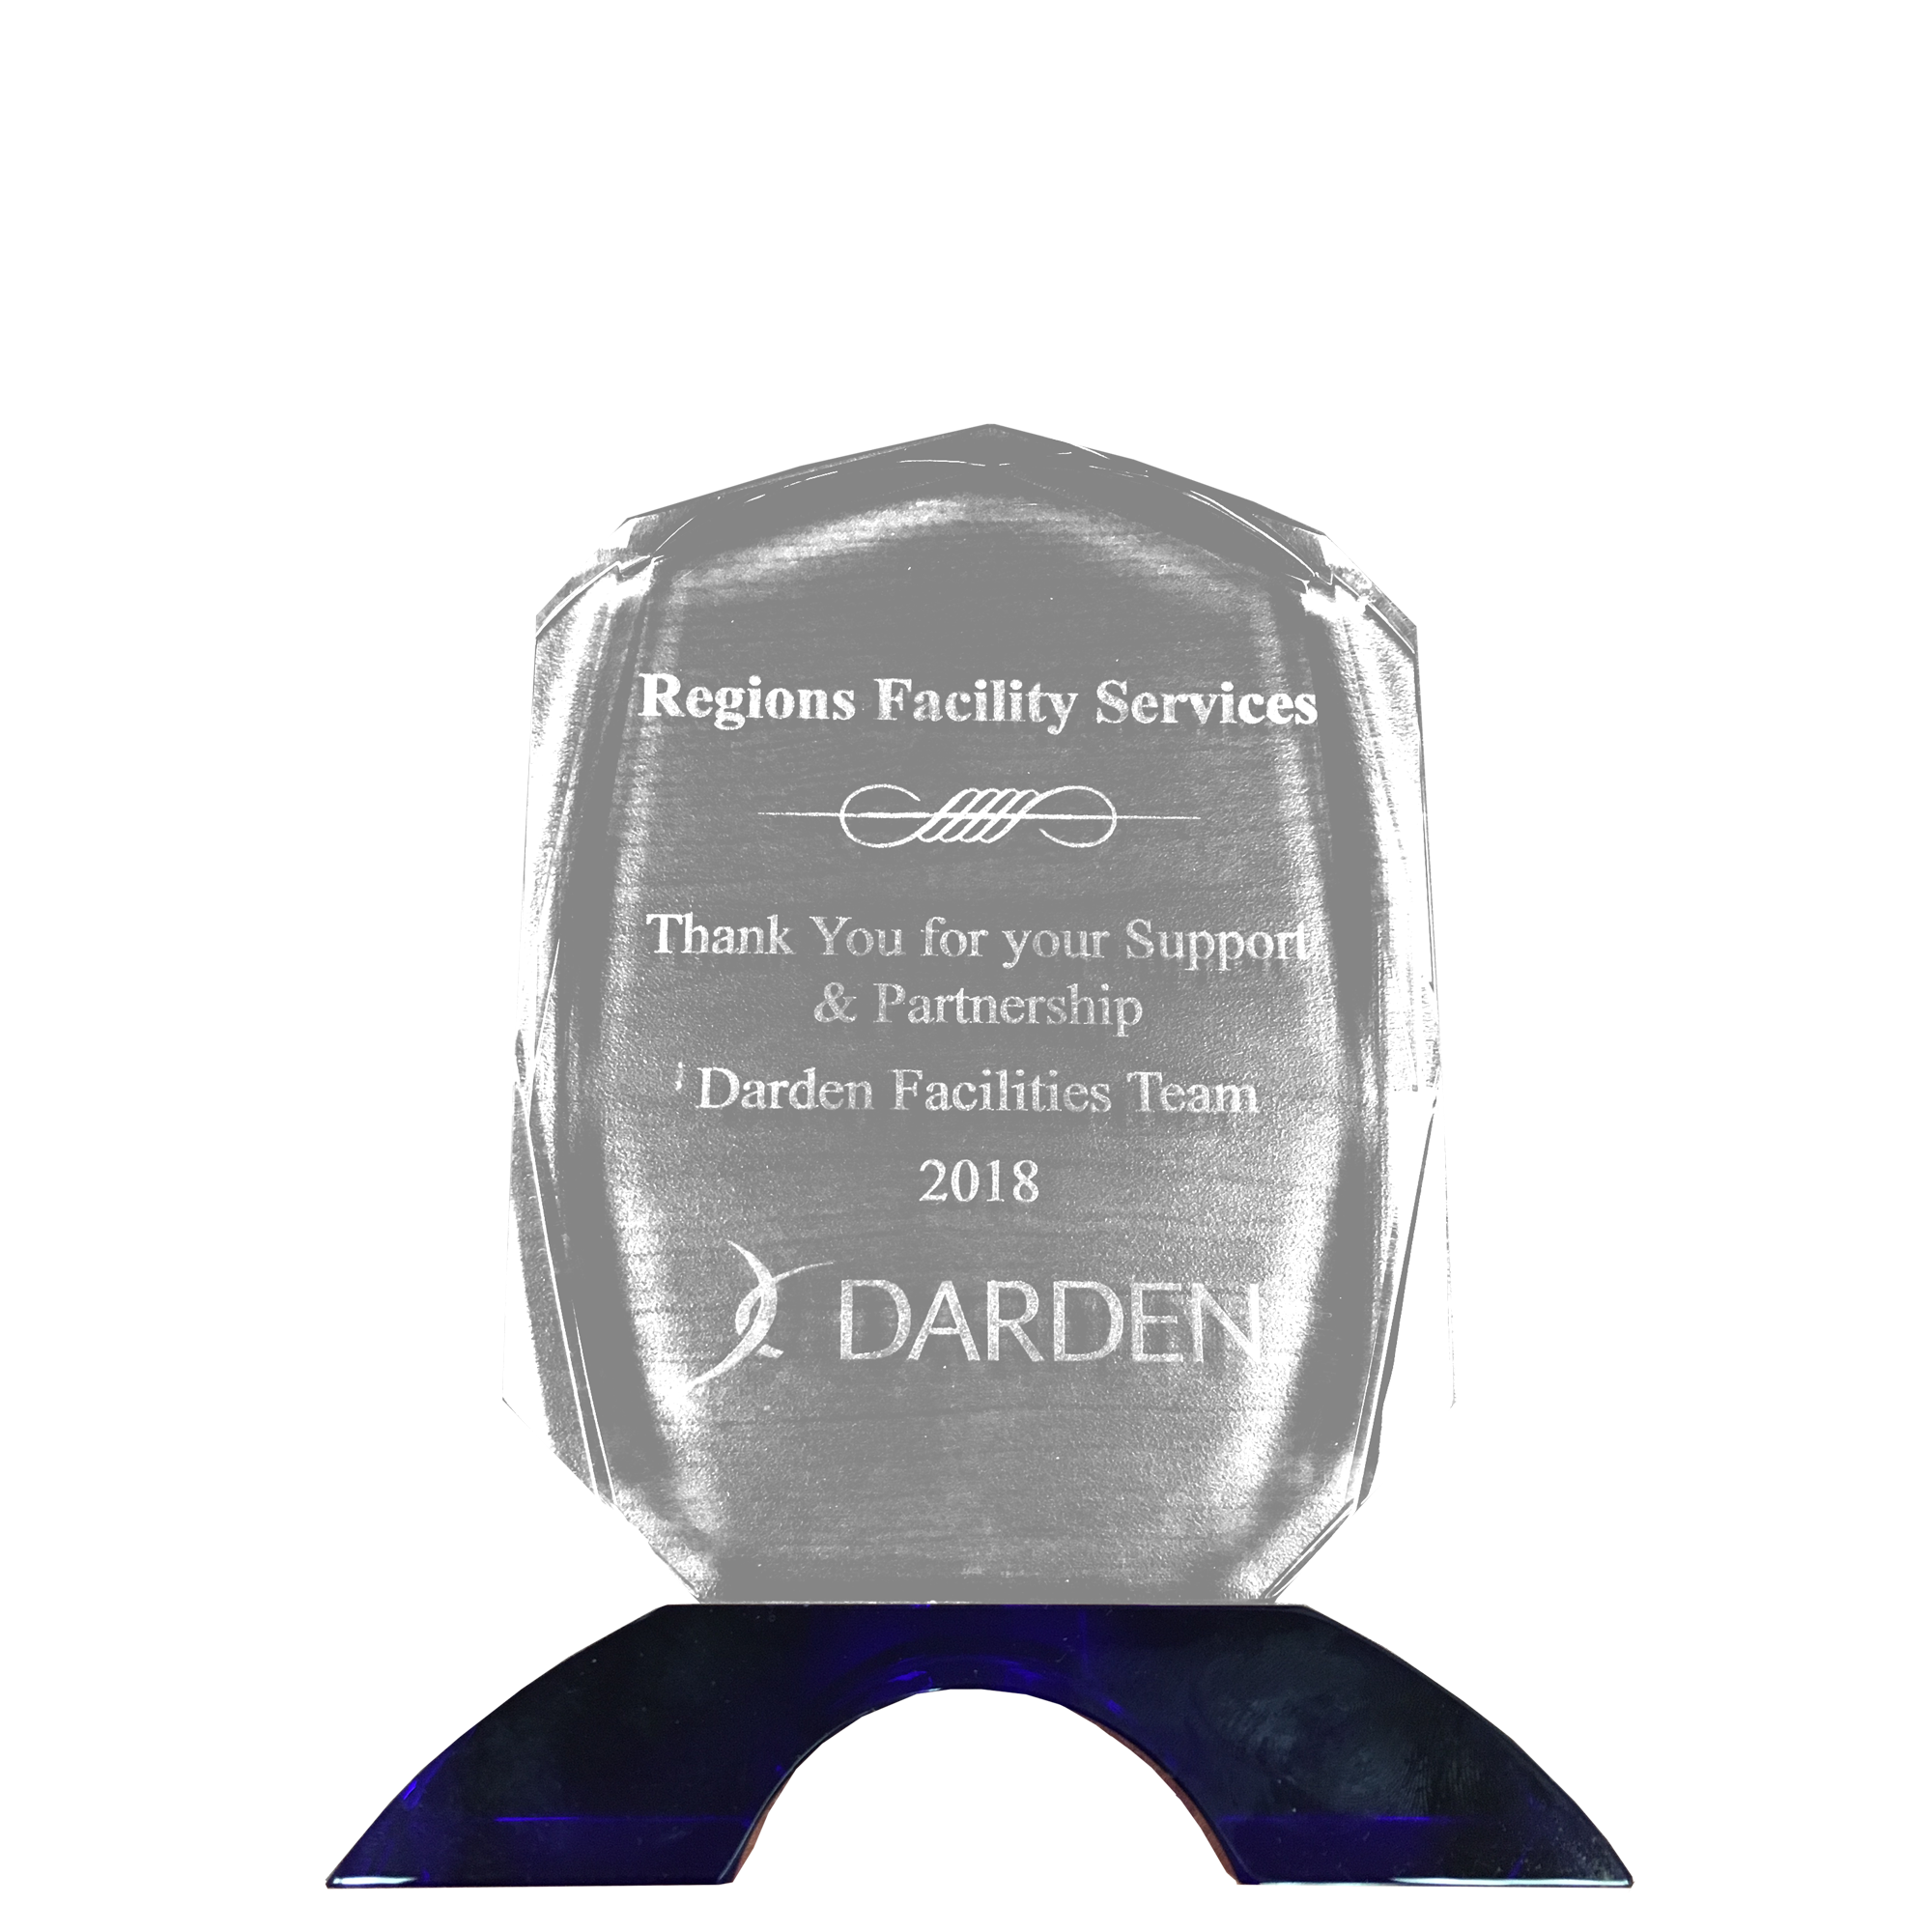 Darden-Vendor-Appreciation-Award-2018.png